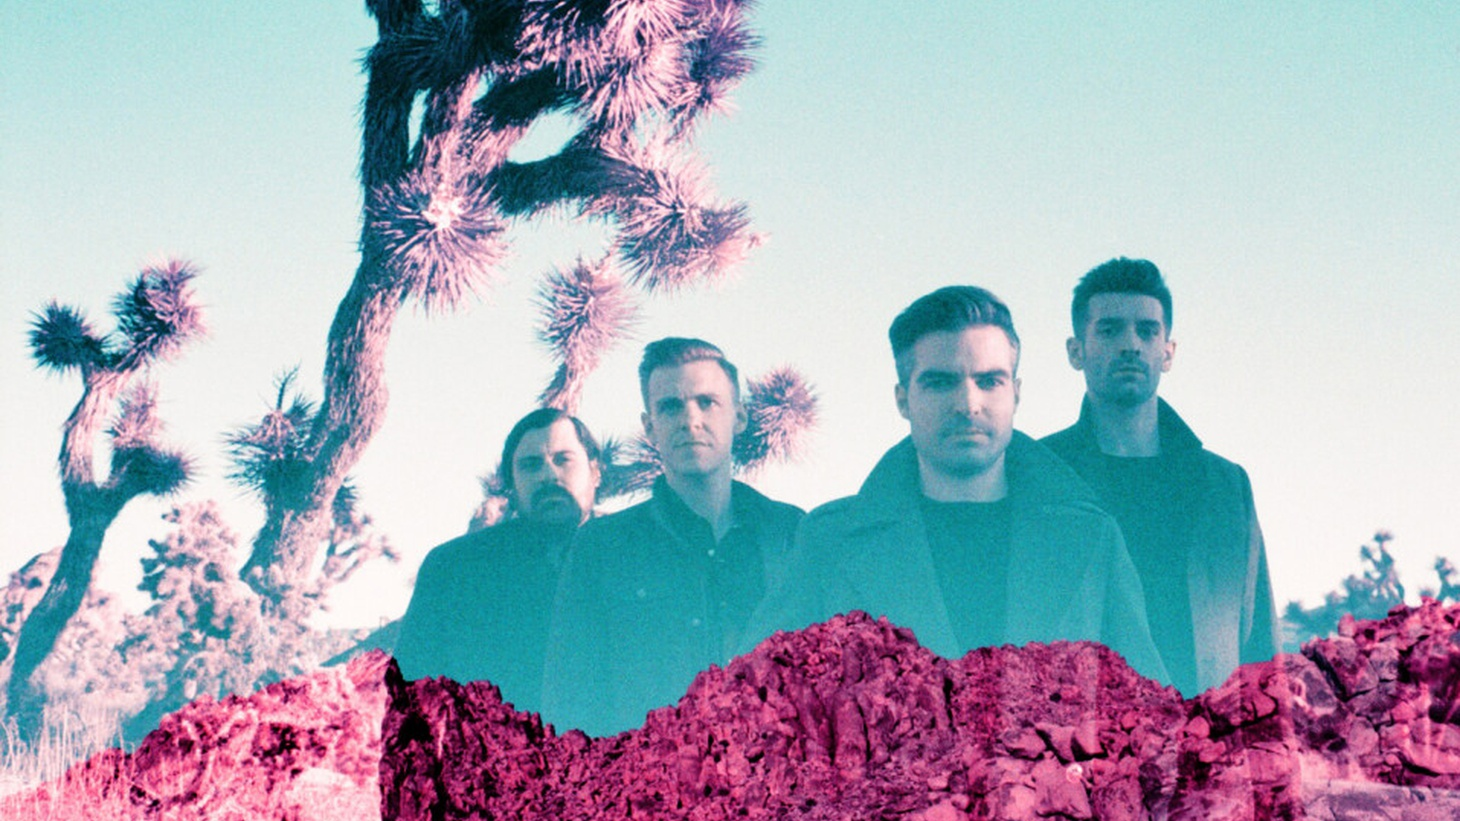 London quartet Boxer Rebellion return with their fifth full-length, Ocean by Ocean.